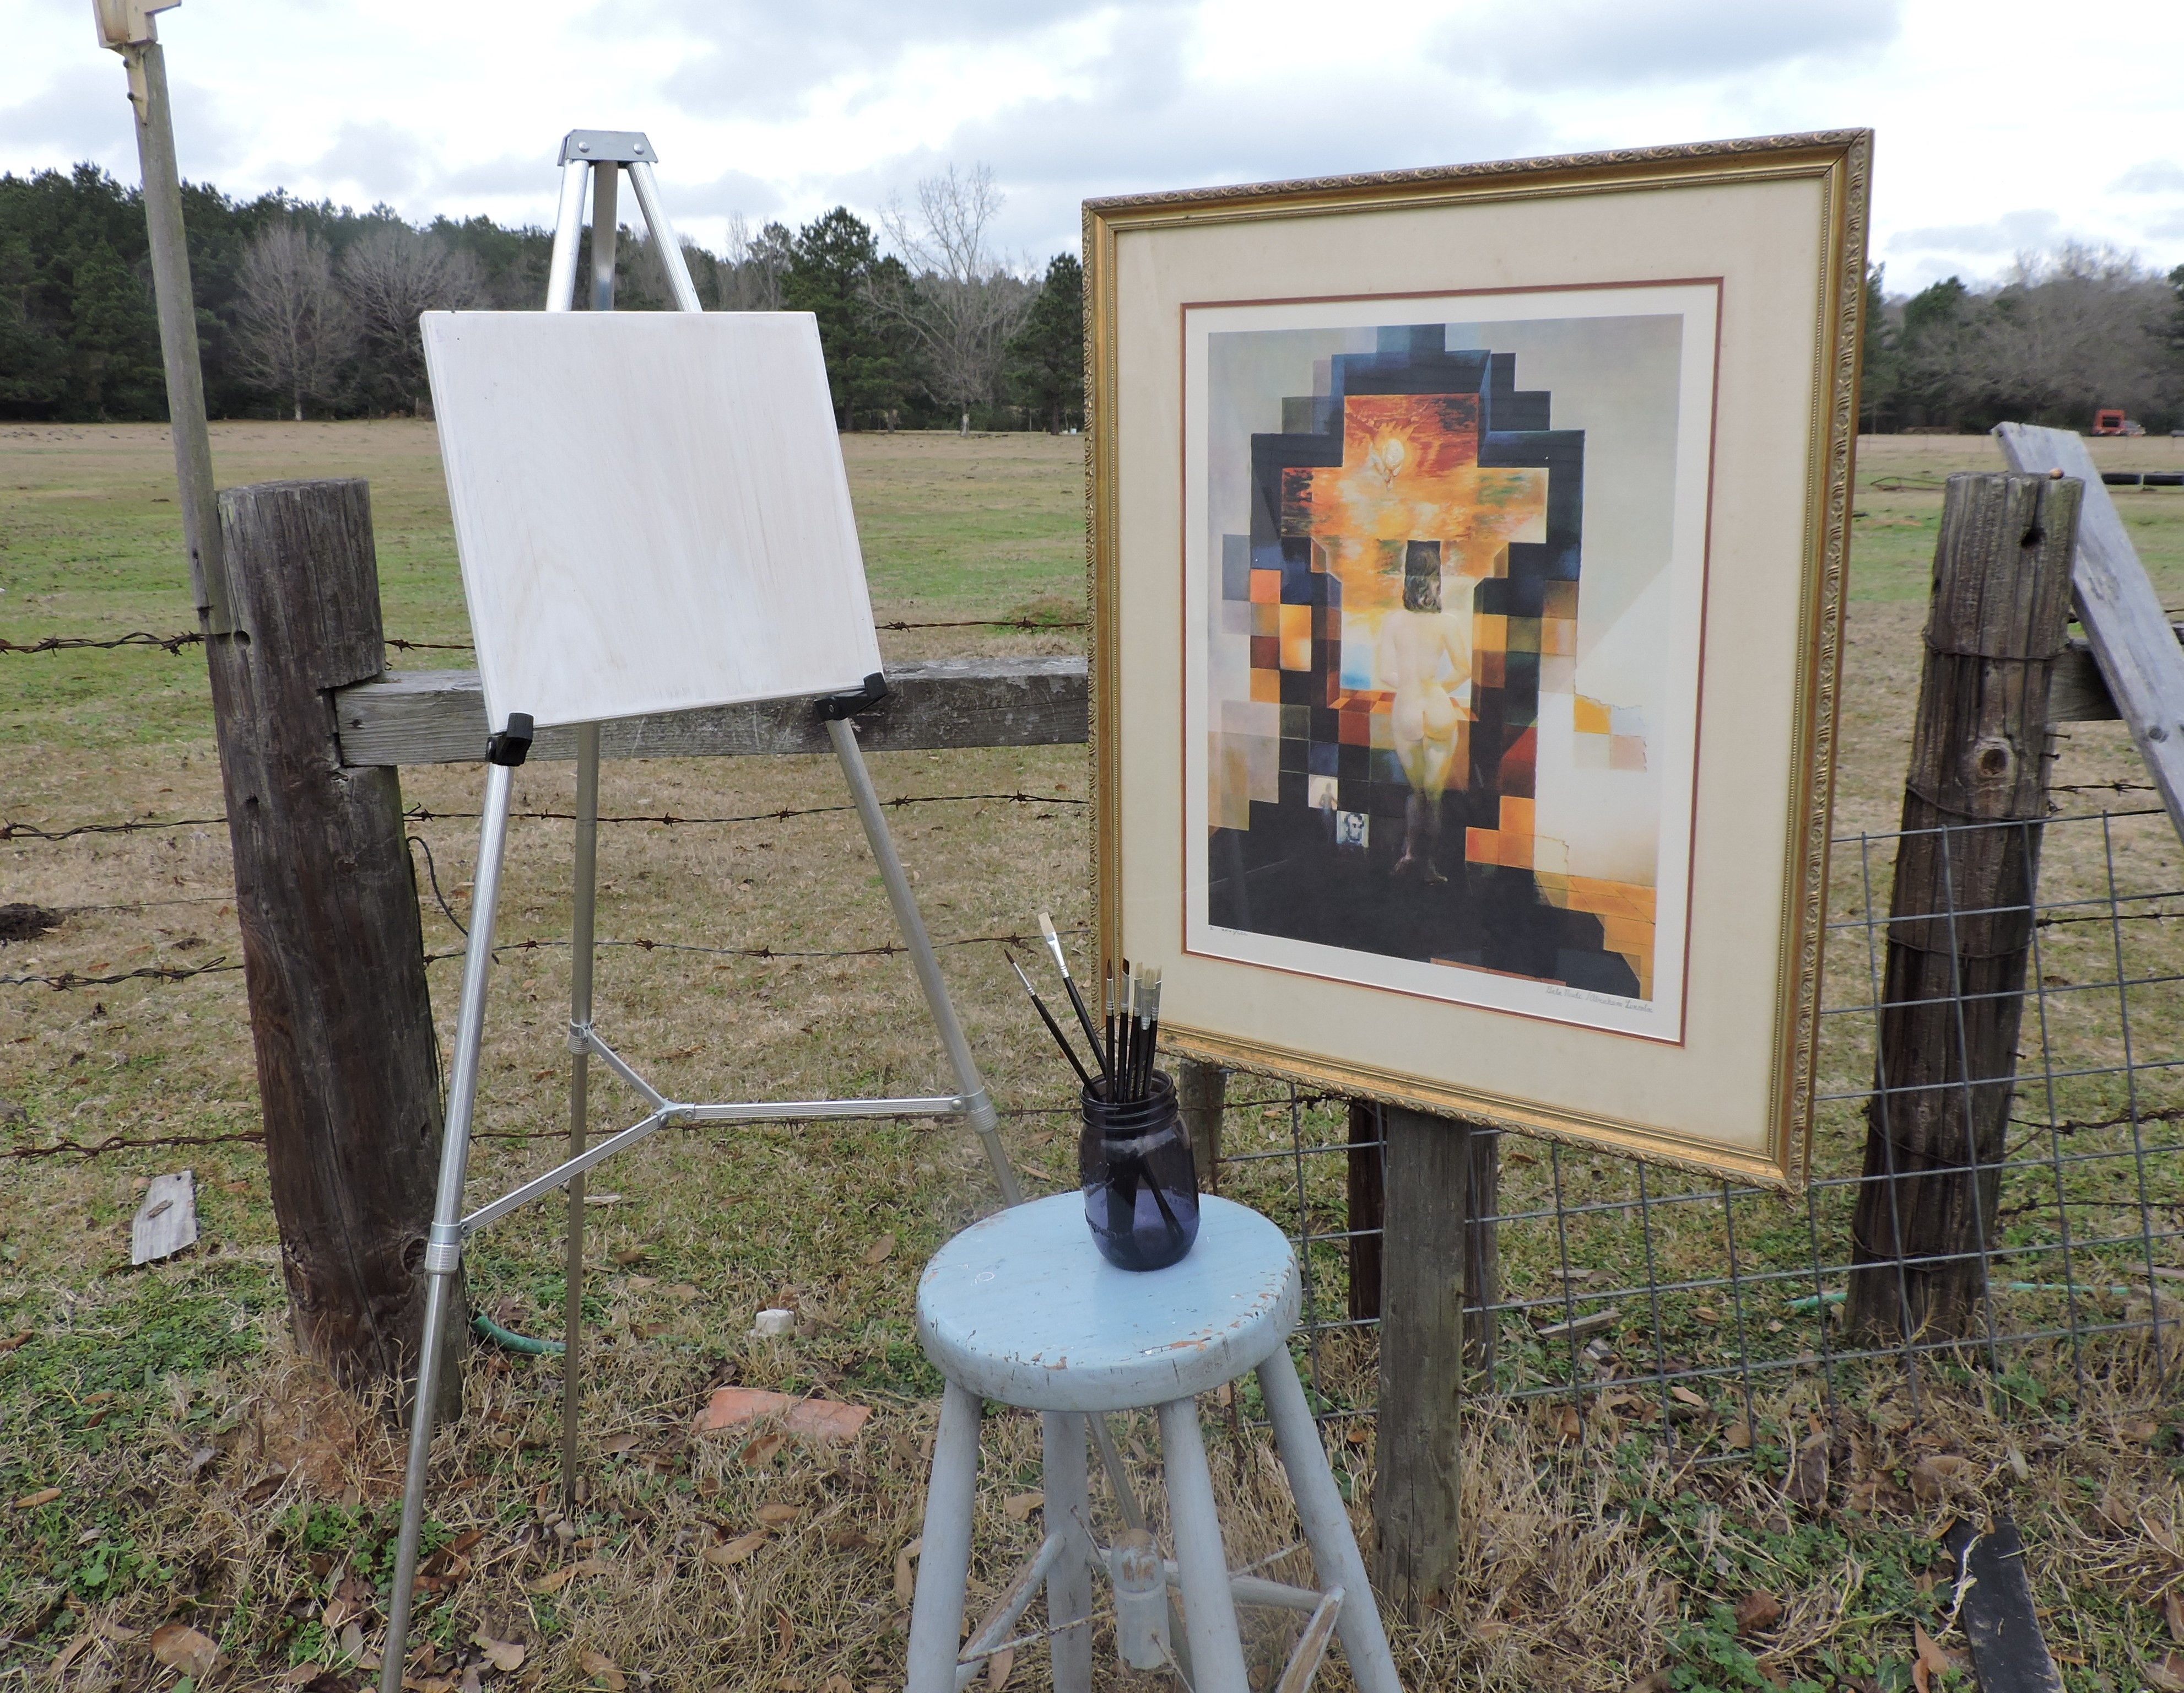 Farming as an Art Form